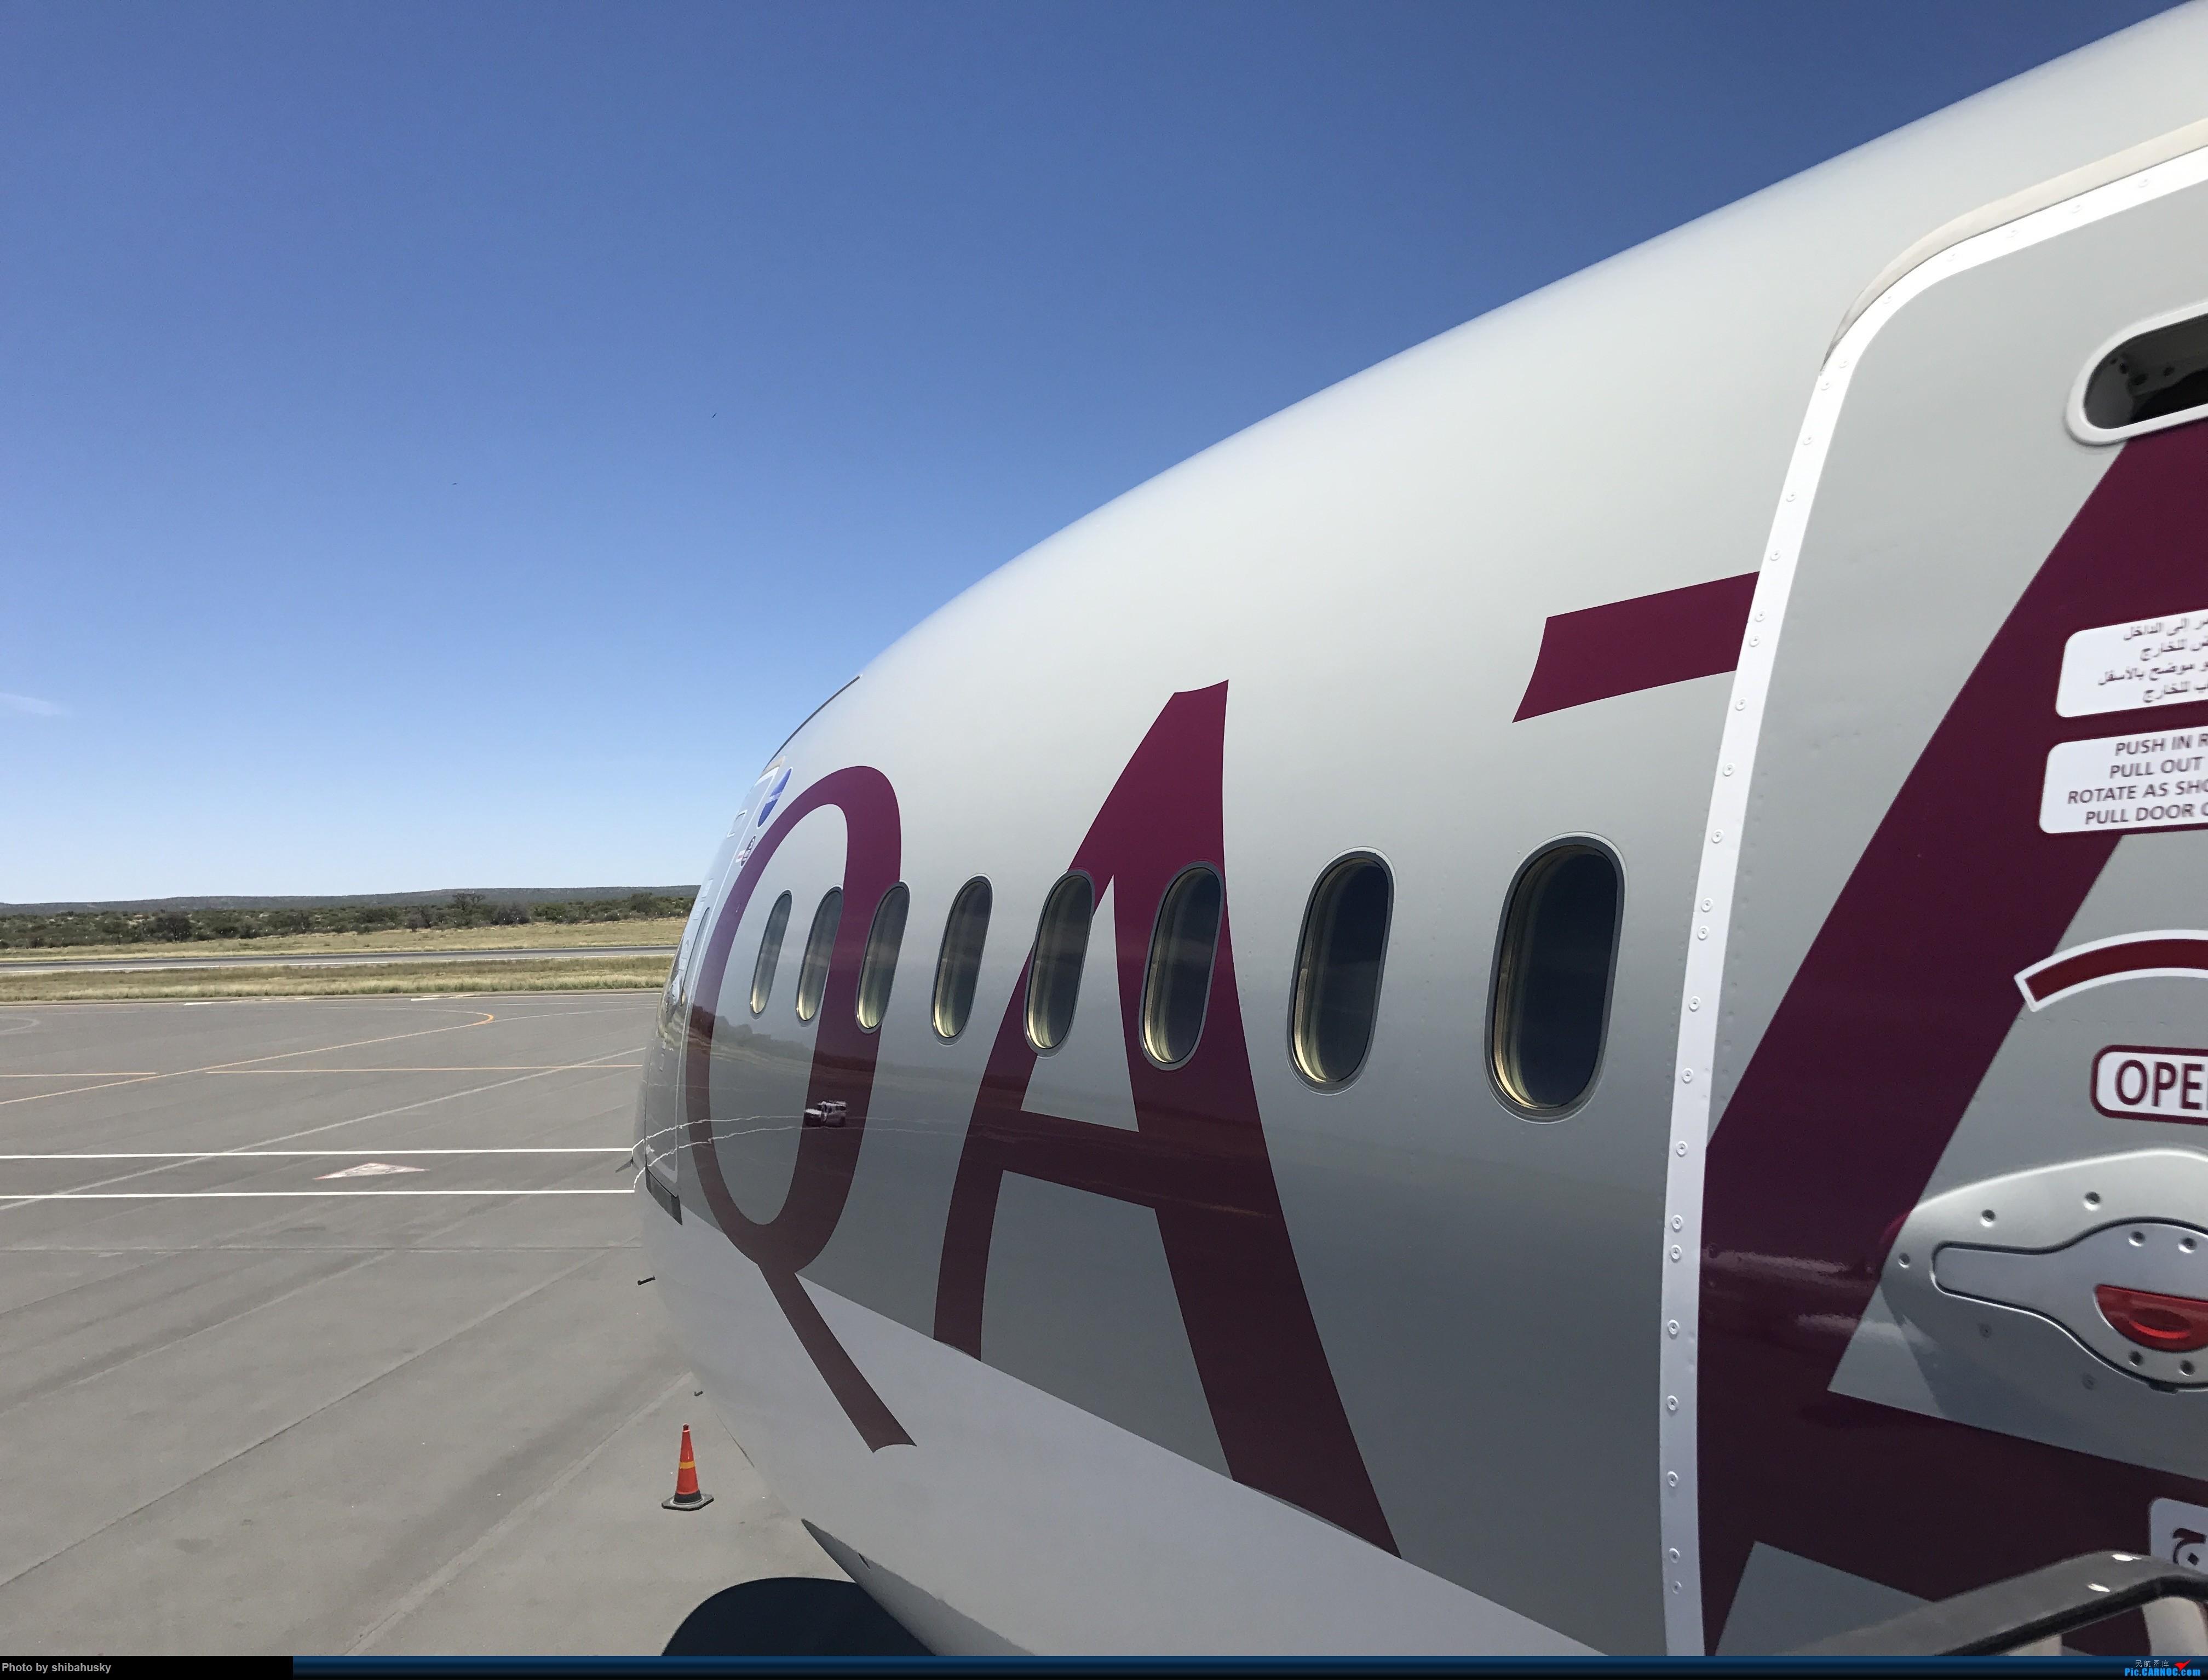 Re:[原创]新人第一帖 WVB-WDH-DOH-CDG-SOU 圣诞纳米比亚游记 体验稀有机型加辗转回英 BOEING 787-8 A7-BDD 温得和克国际机场